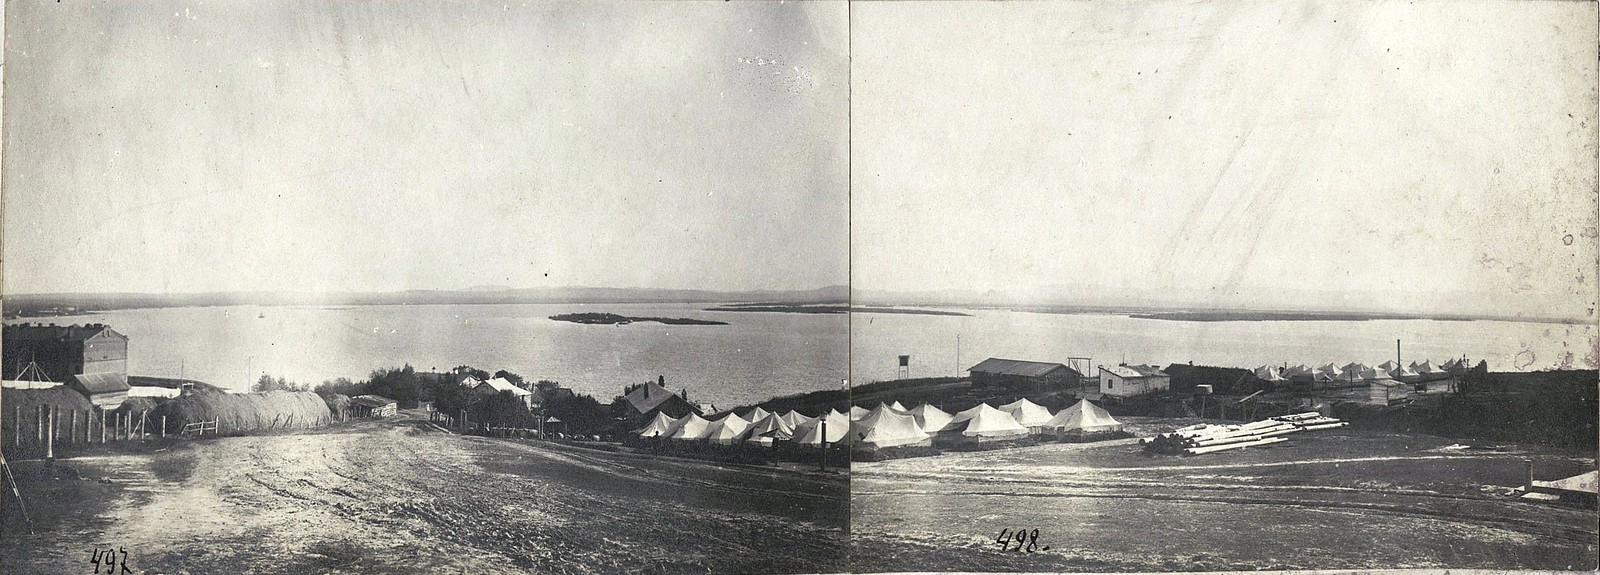 10. Панорама устья реки Уссури. 1912